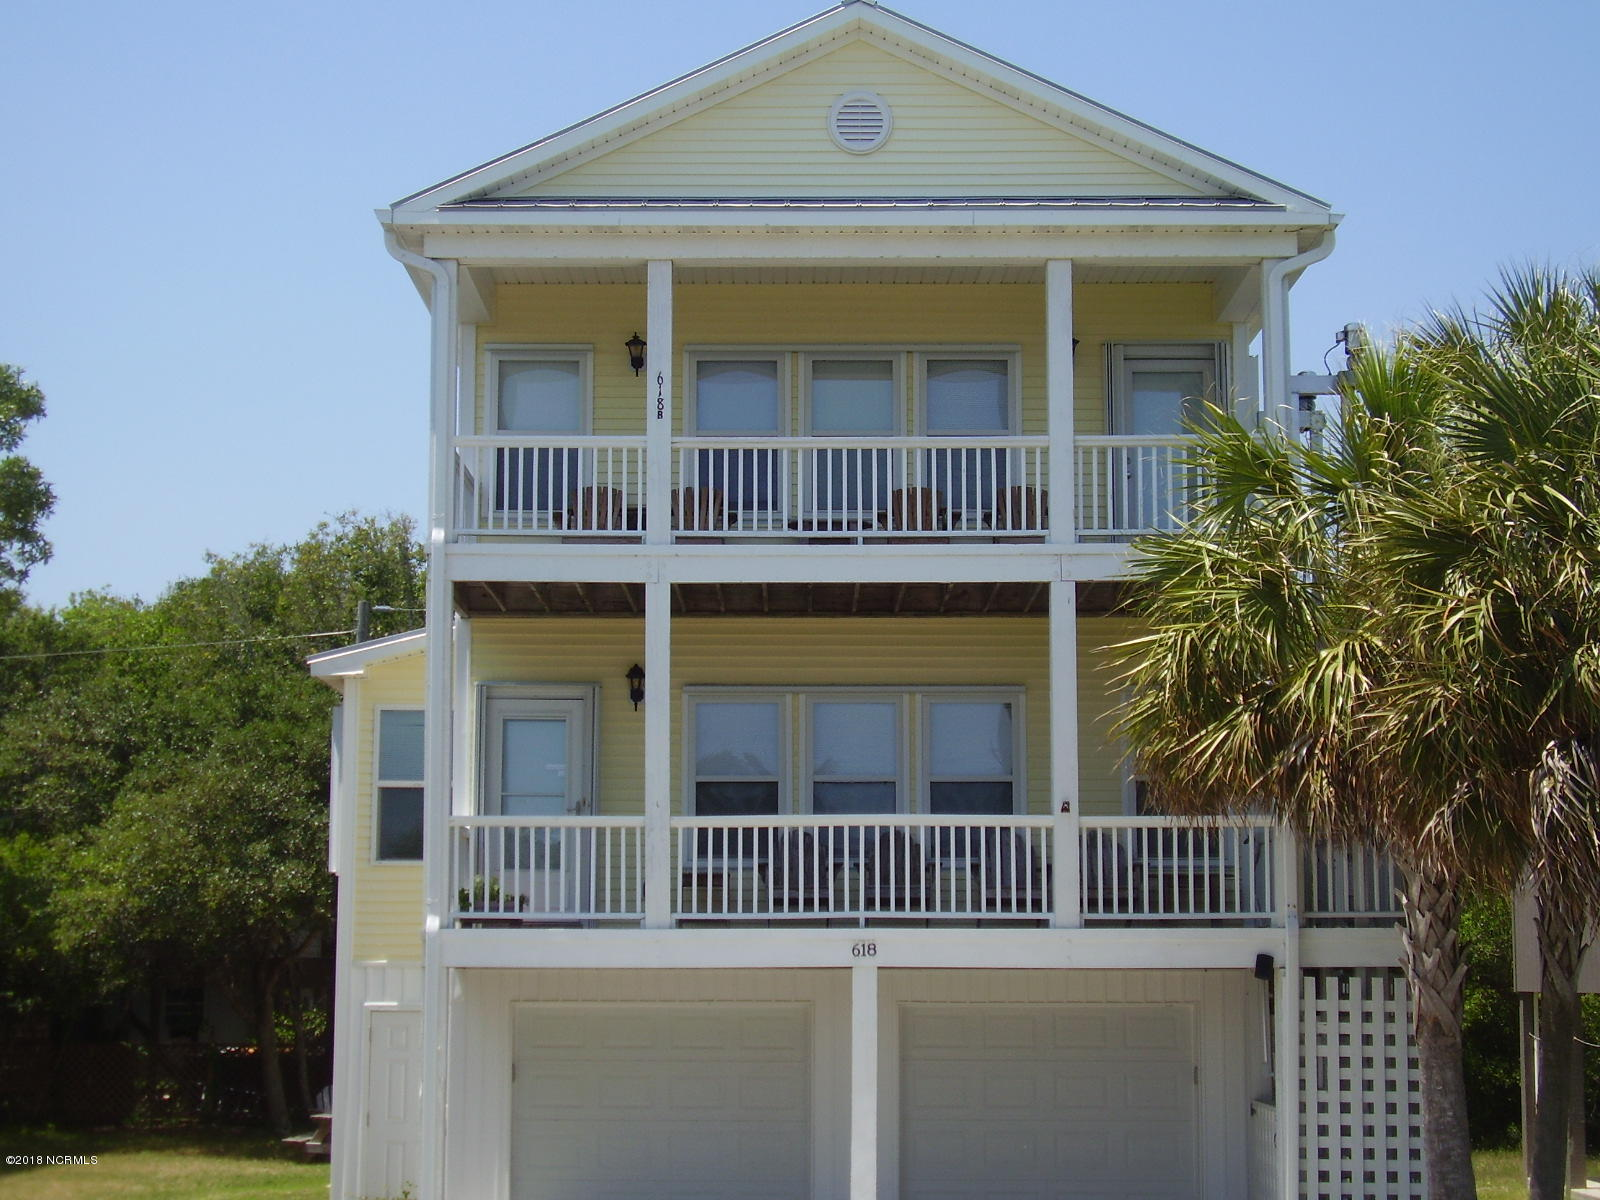 618 4th Avenue, Kure Beach, North Carolina, 5 Bedrooms Bedrooms, 10 Rooms Rooms,3 BathroomsBathrooms,Condominium,For sale,4th,100118264